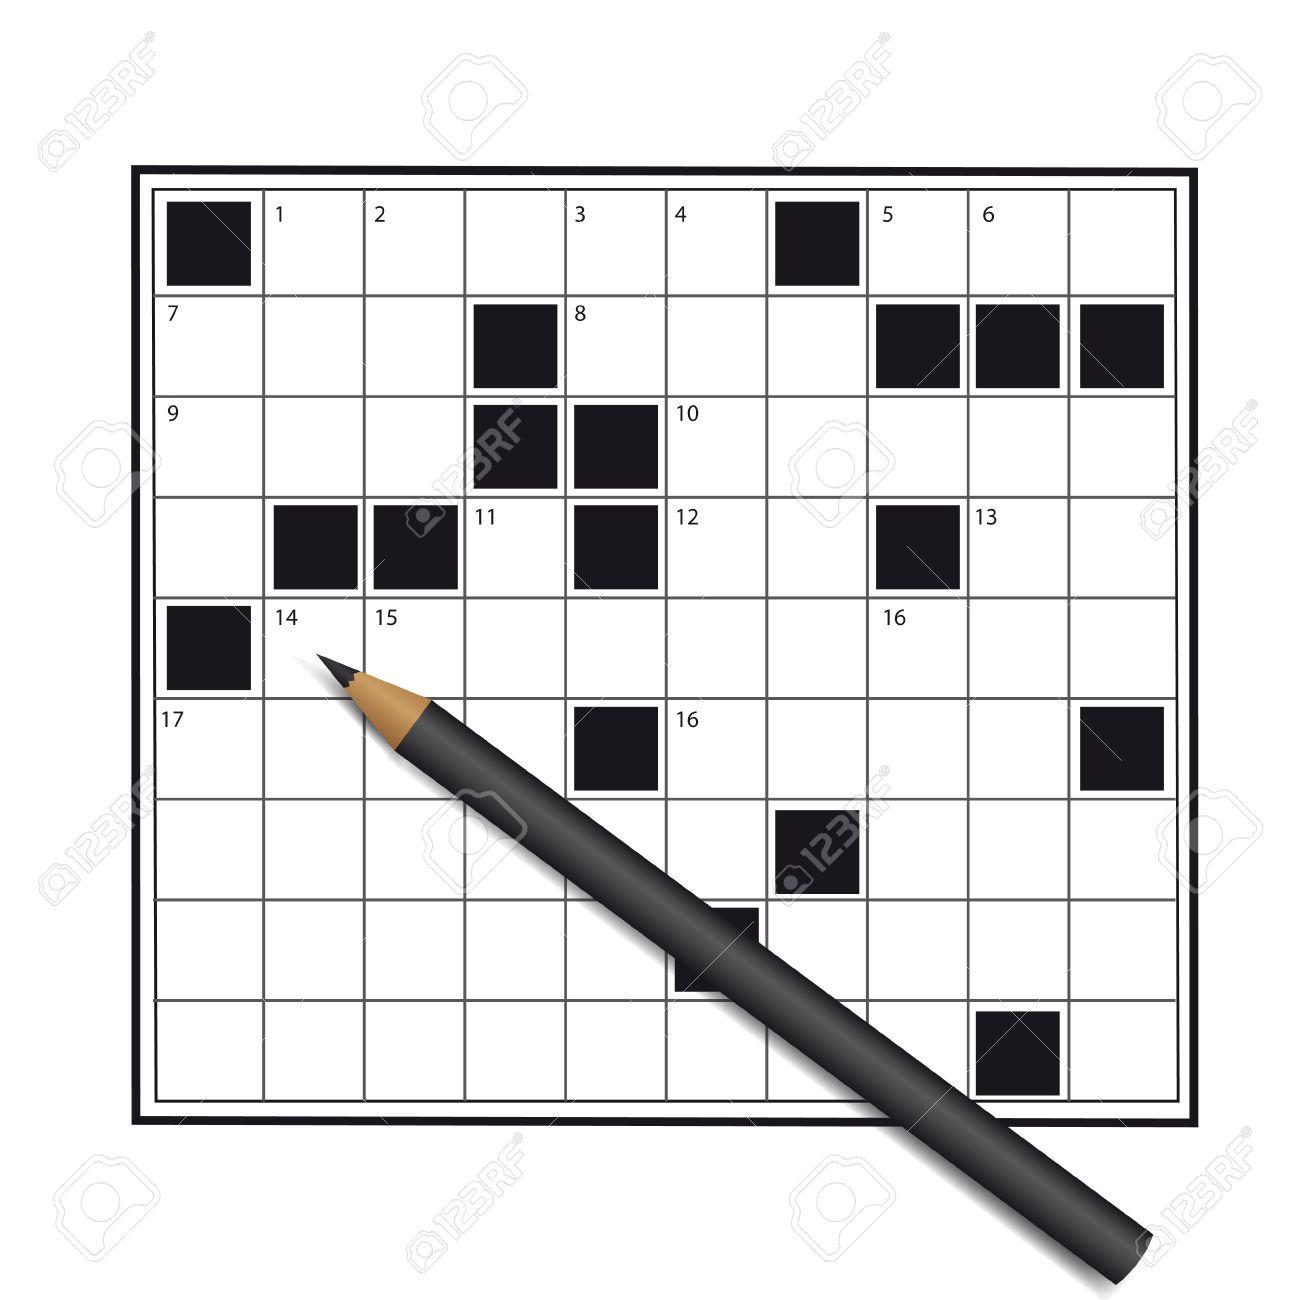 Crossword Empty Unfinished Stock Vector